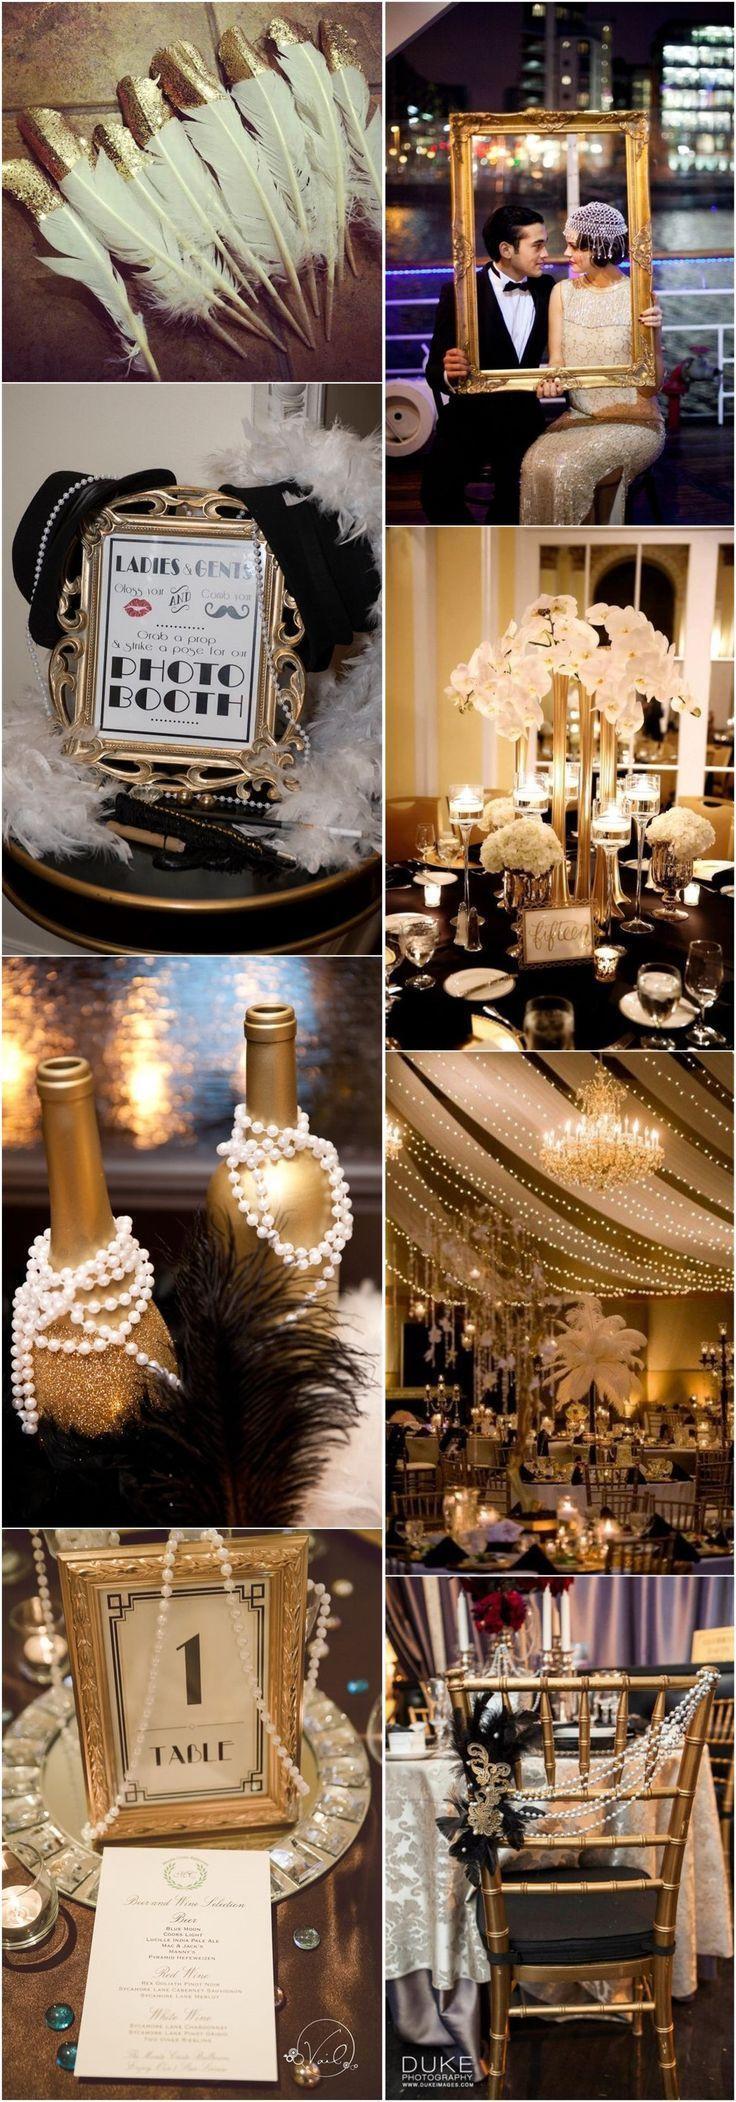 Black and gold great gatsby wedding ideas